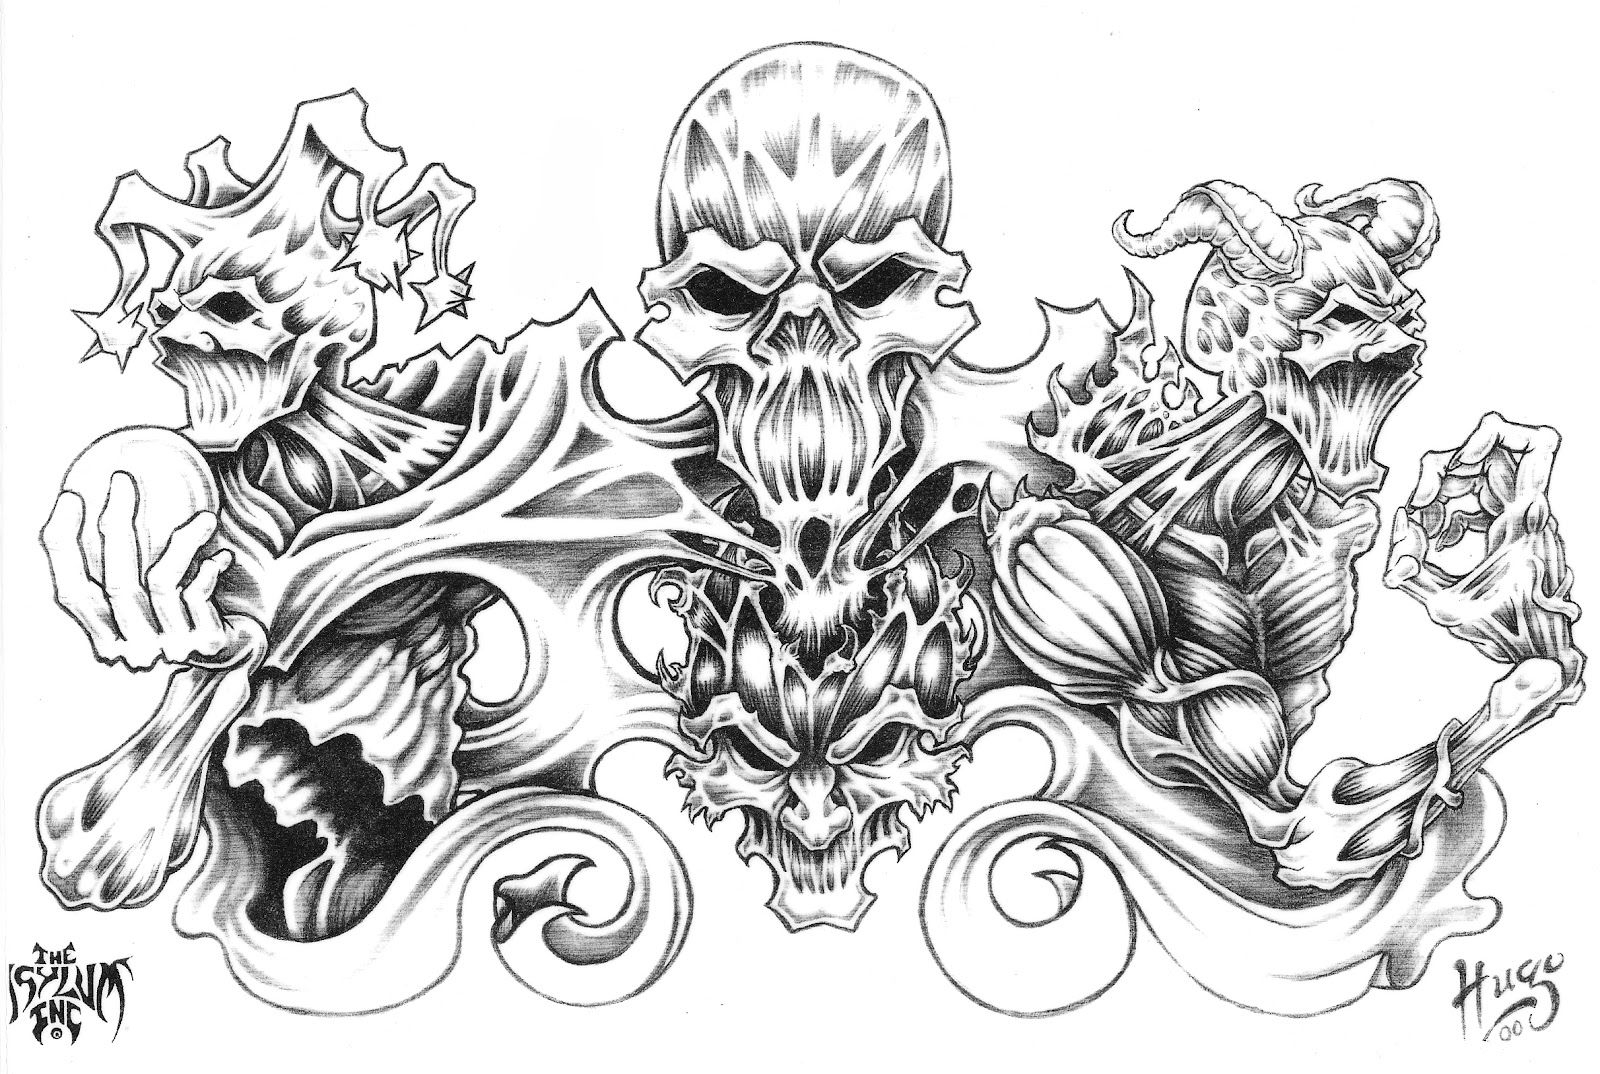 Large Free Printable Tattoo Designs | Best Quarter Sleeve Tattoo - Free Printable Tattoo Designs